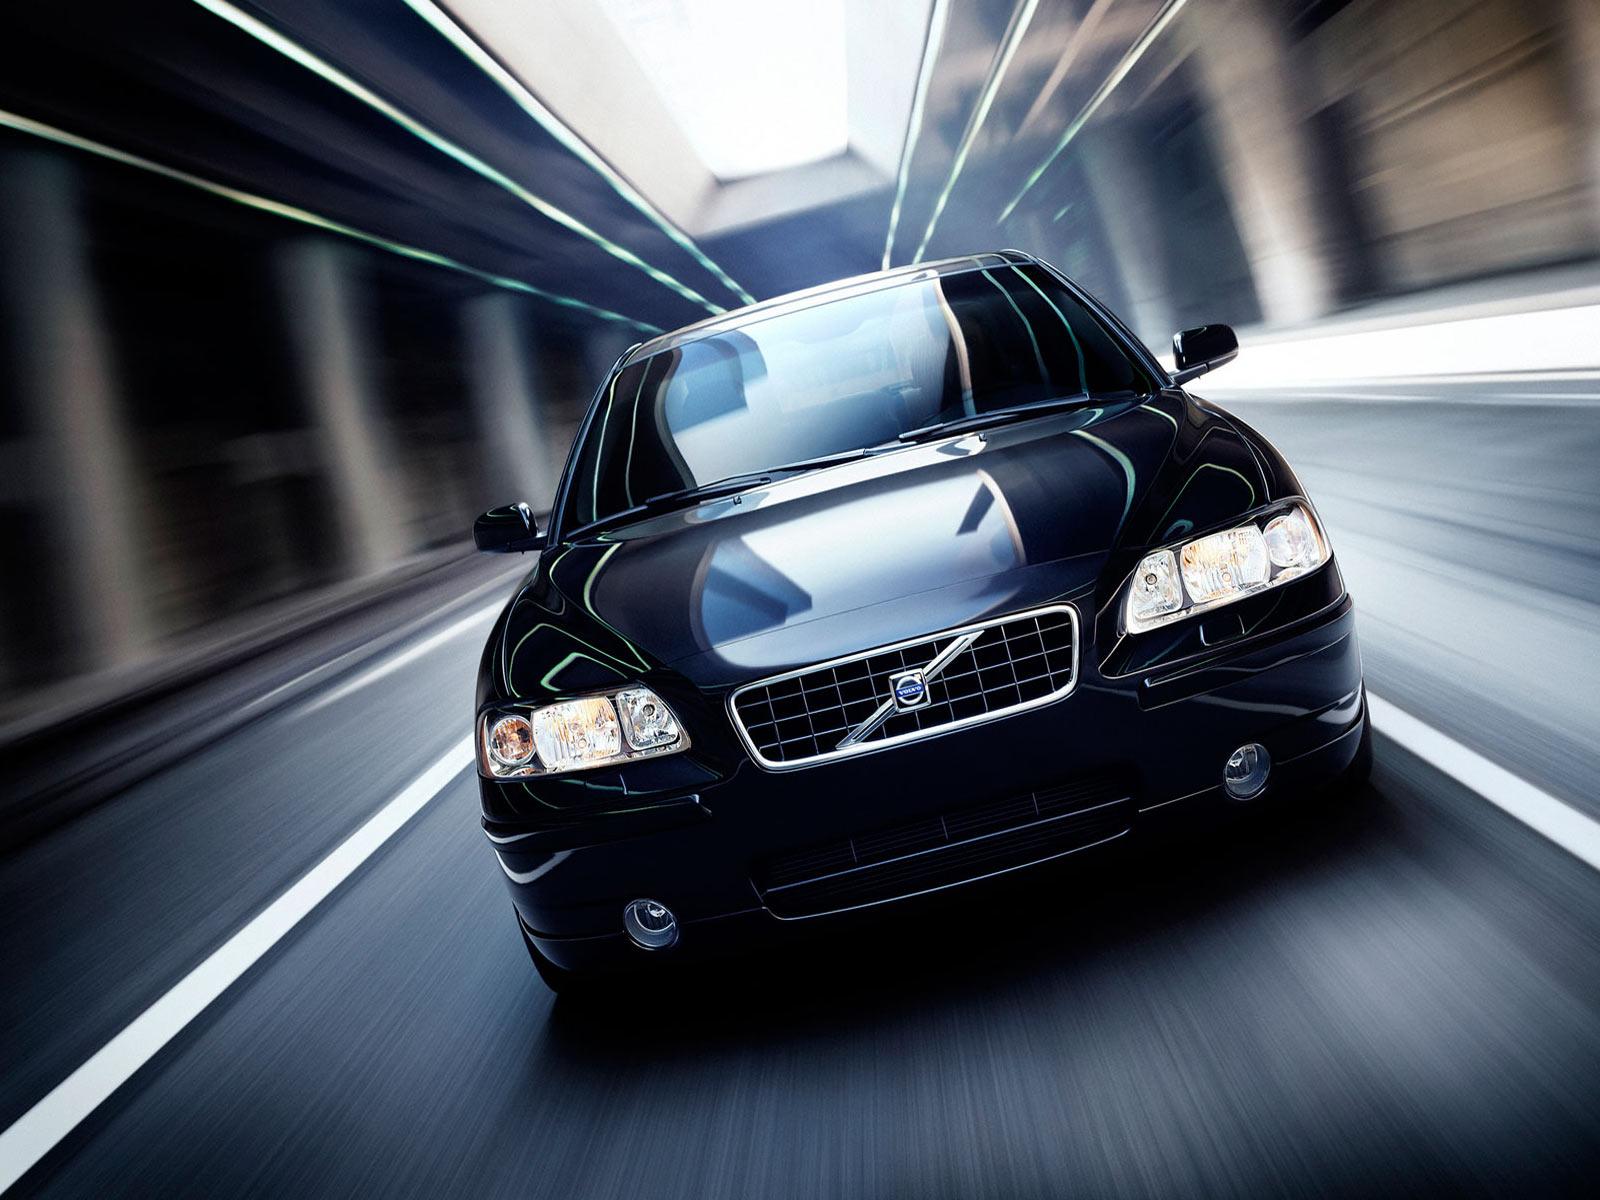 Volvo V60 Wallpaper 8   1600 X 1200 stmednet 1600x1200